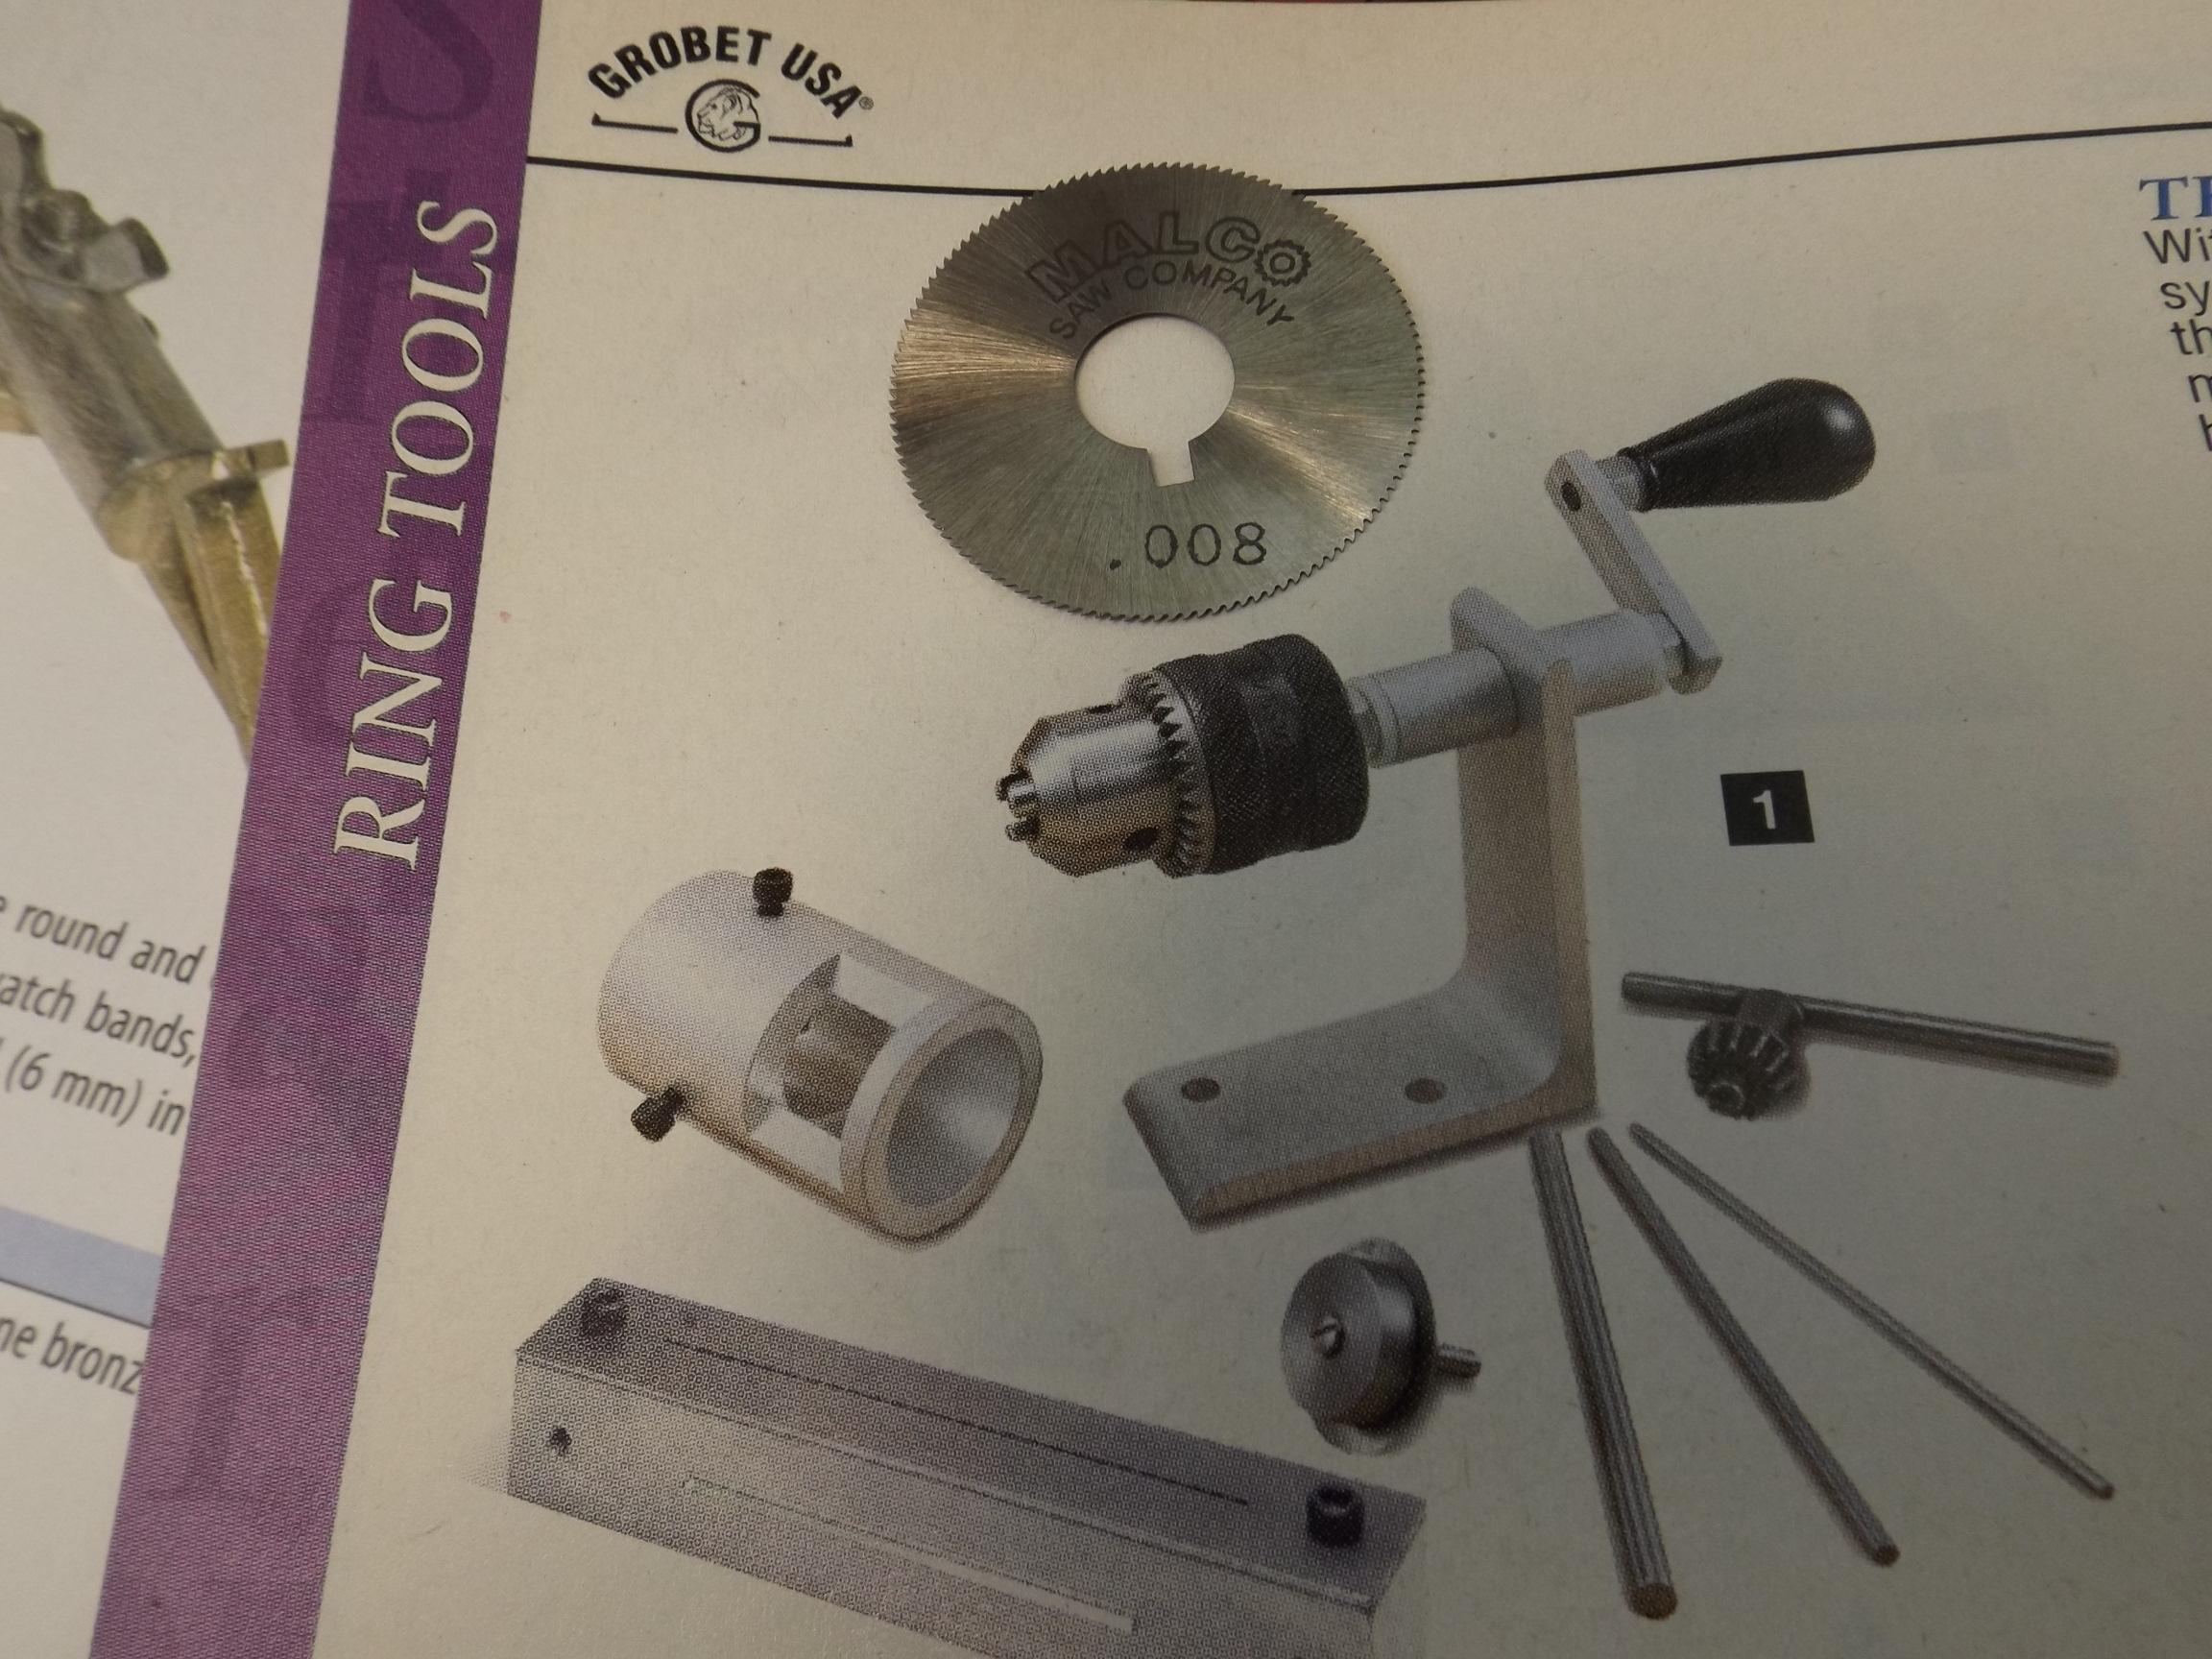 43.114 Saw Blade for Grobet Jump Ringer Machines- HO701/1